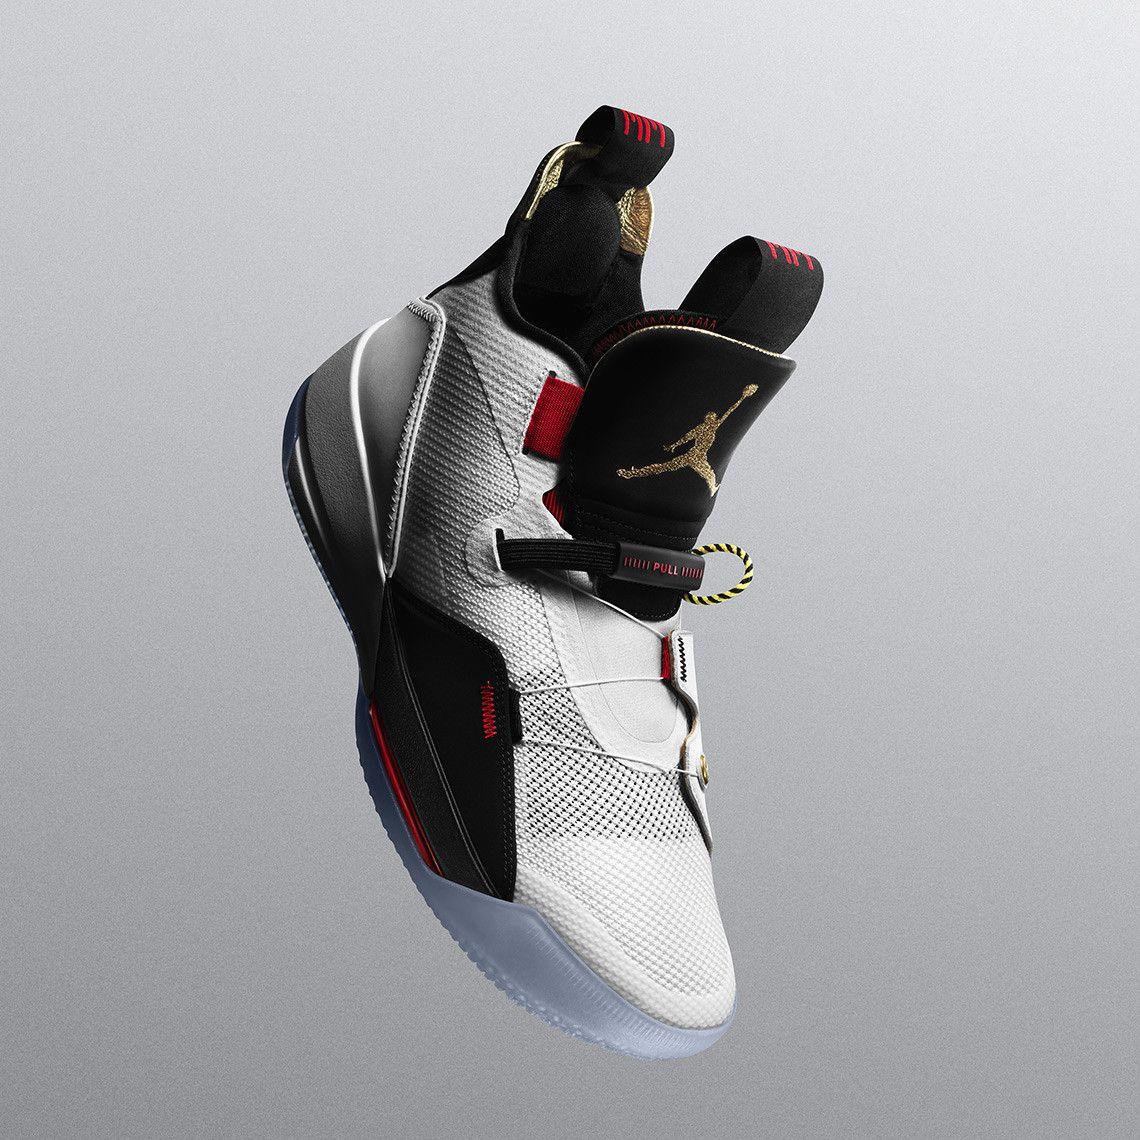 a81f94afe802 Jordan Brand Officially Unveils The Air Jordan 33